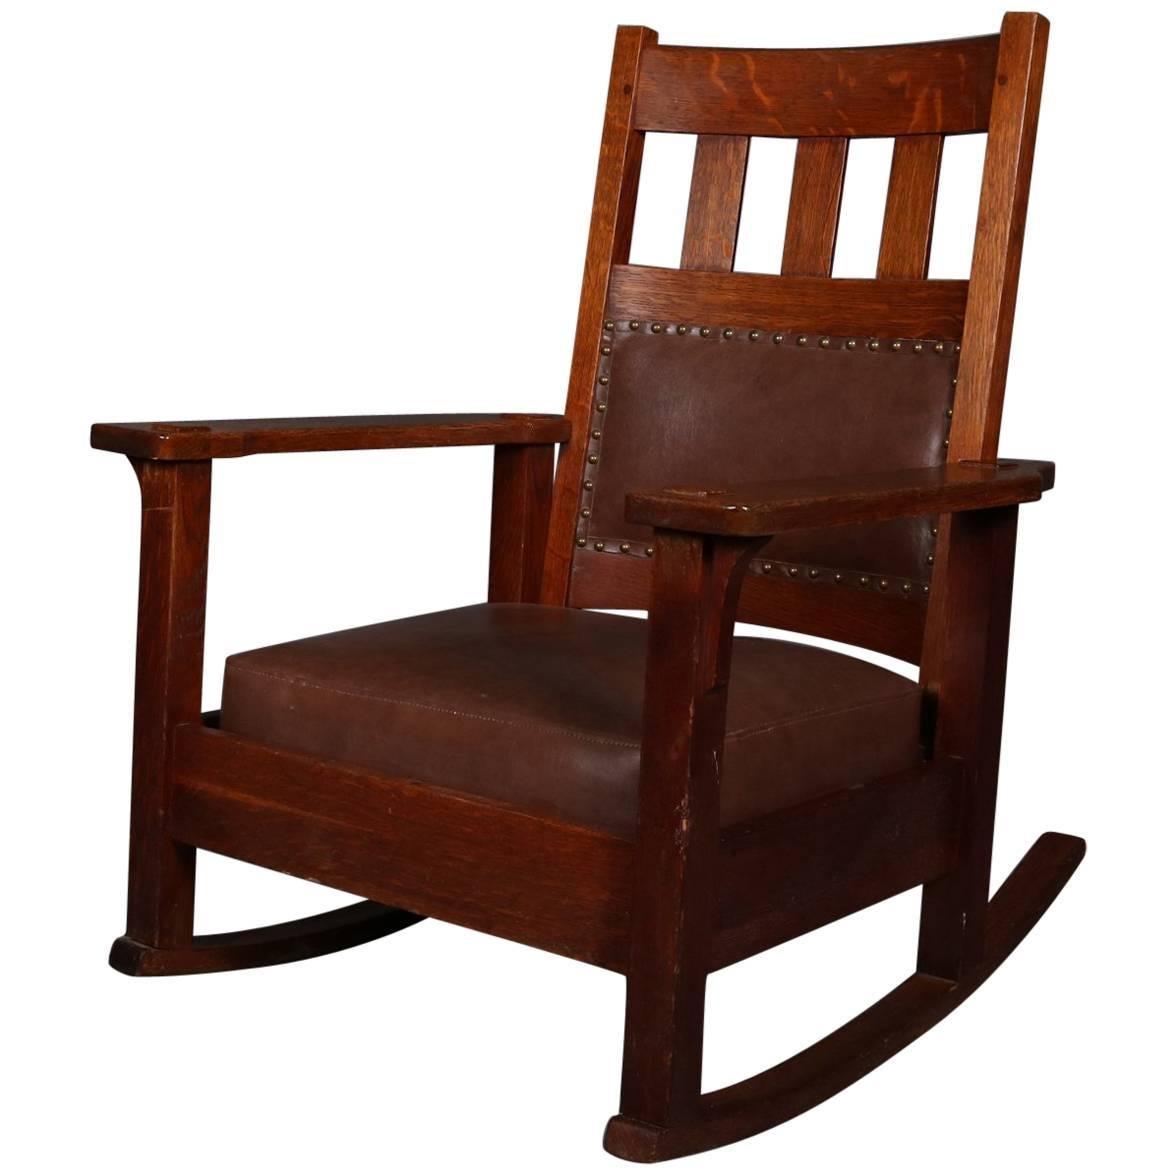 Antique Arts U0026 Crafts Stickley Brothers Upholstered Rocking Chair, Signed  For Sale